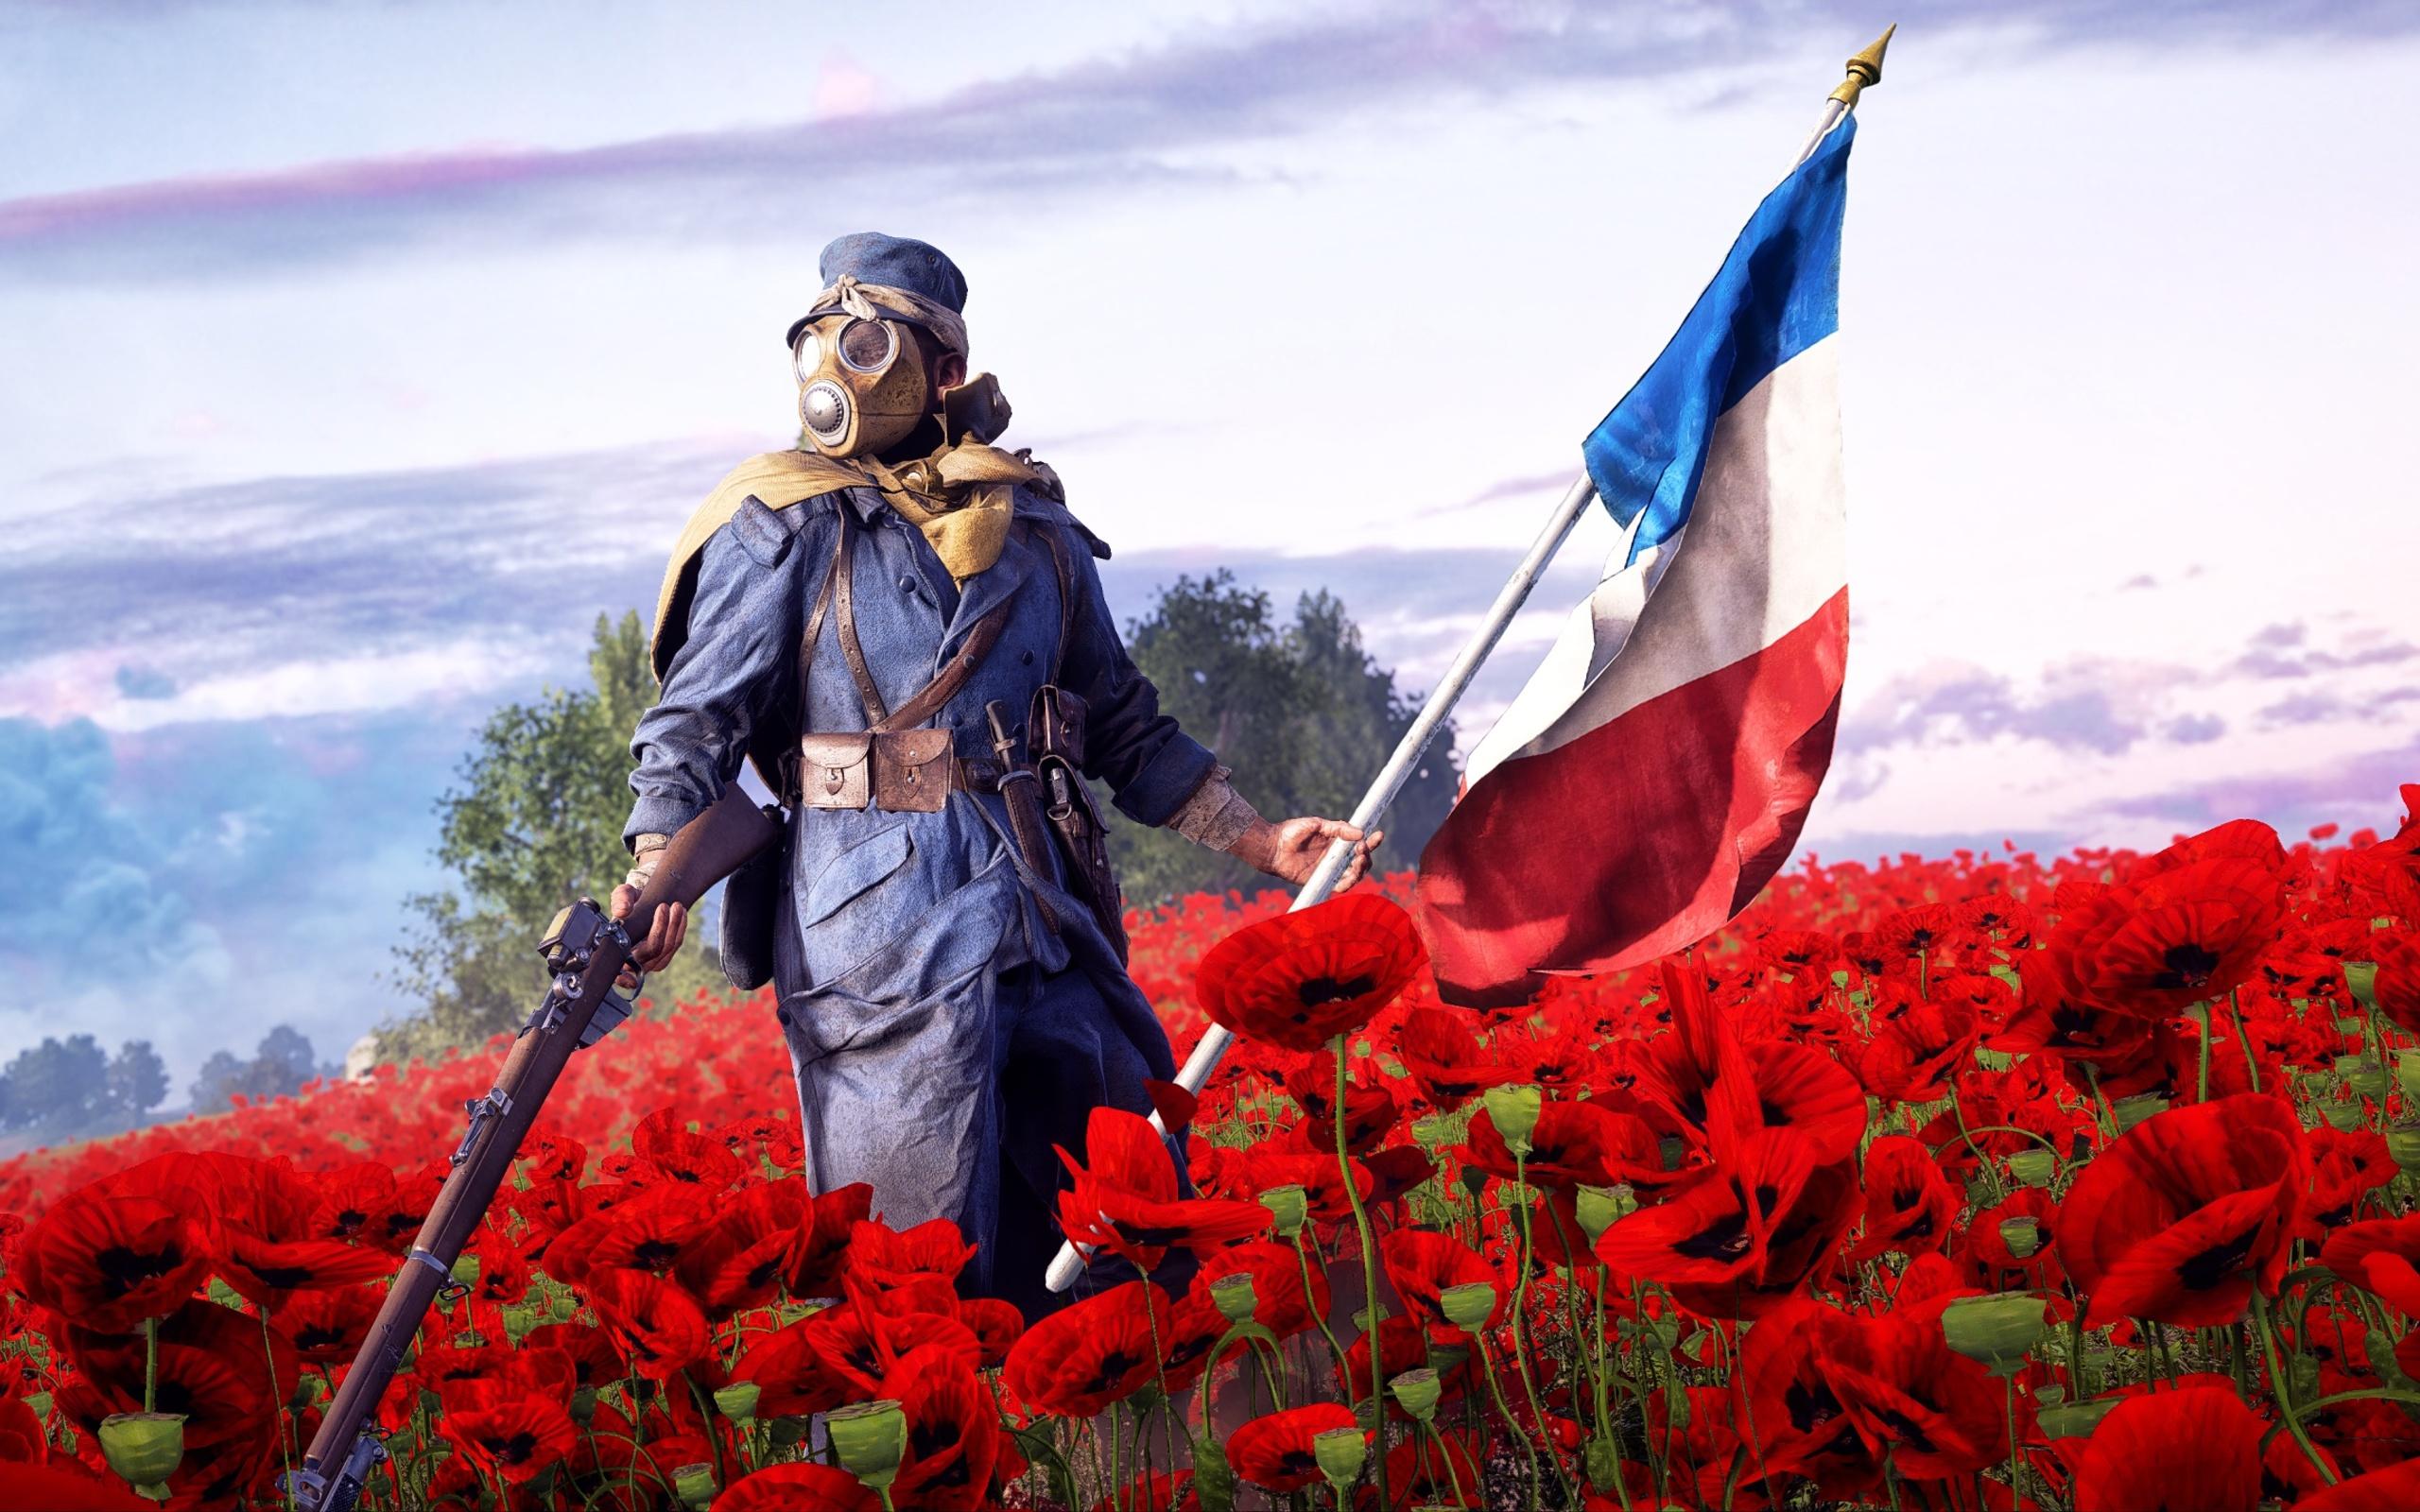 2560x1600 Soldier Battlefield 1 2560x1600 Resolution HD 4k ...